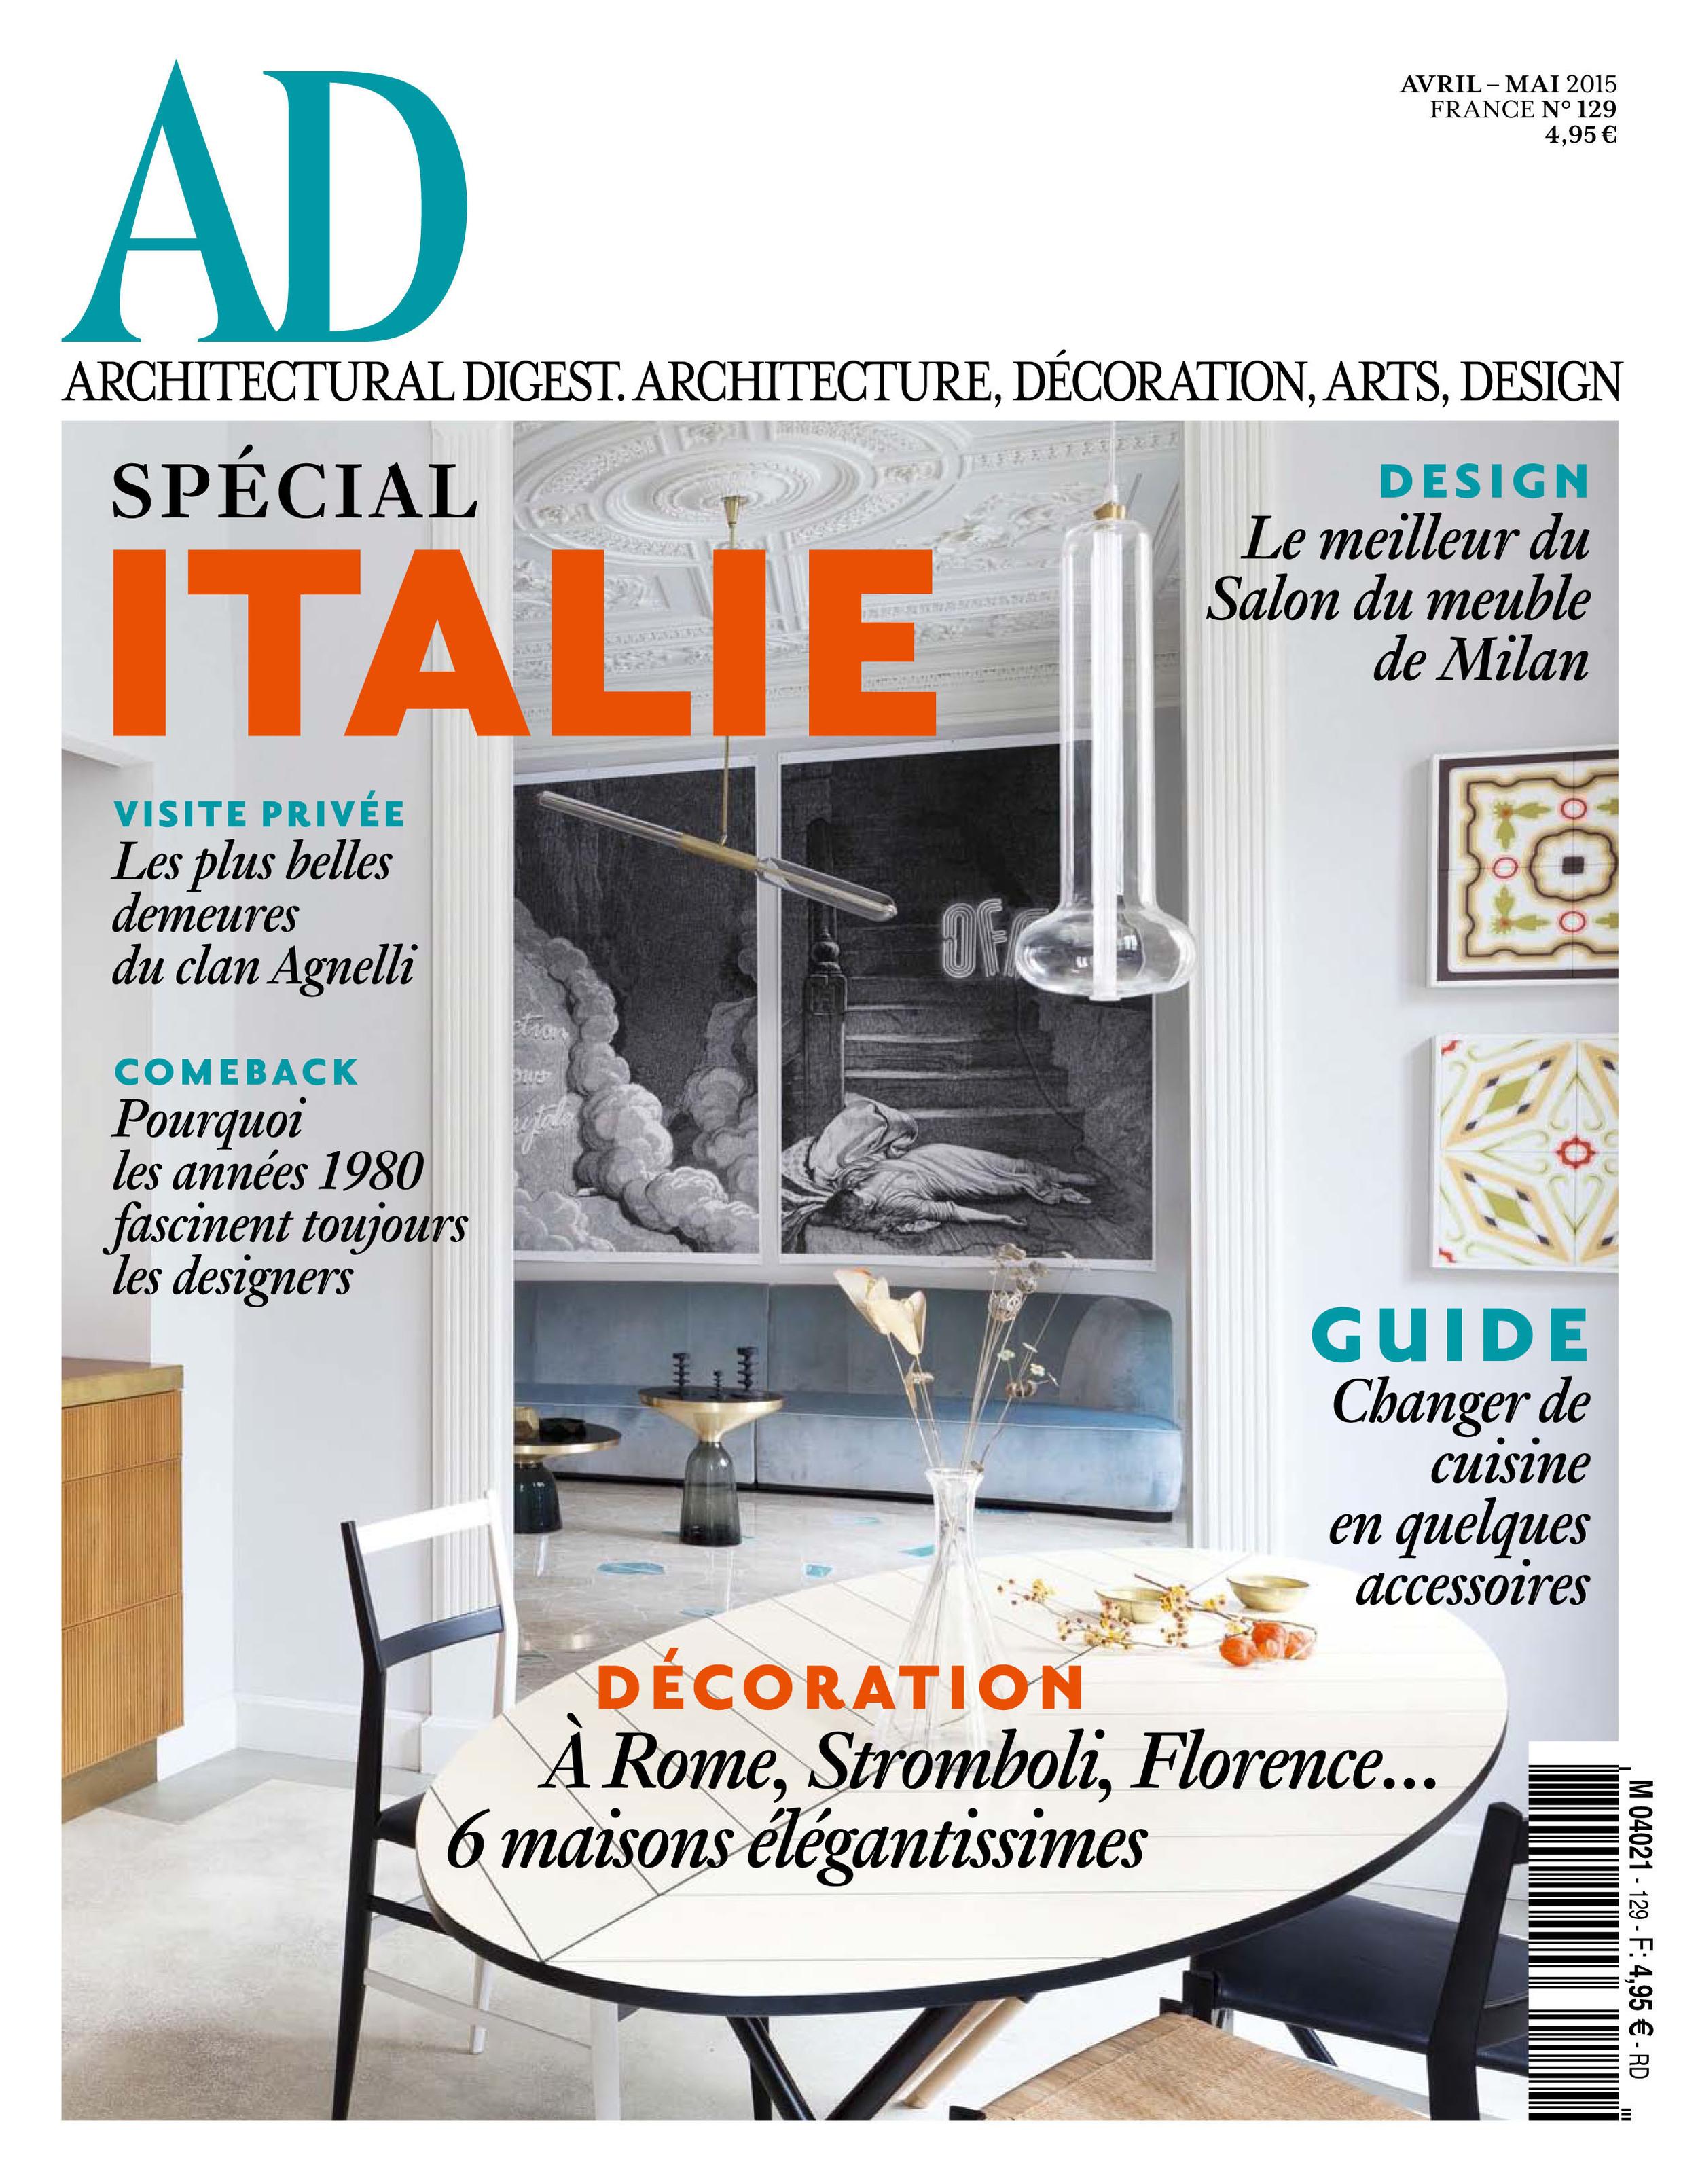 AD_France_April2015_1.jpg